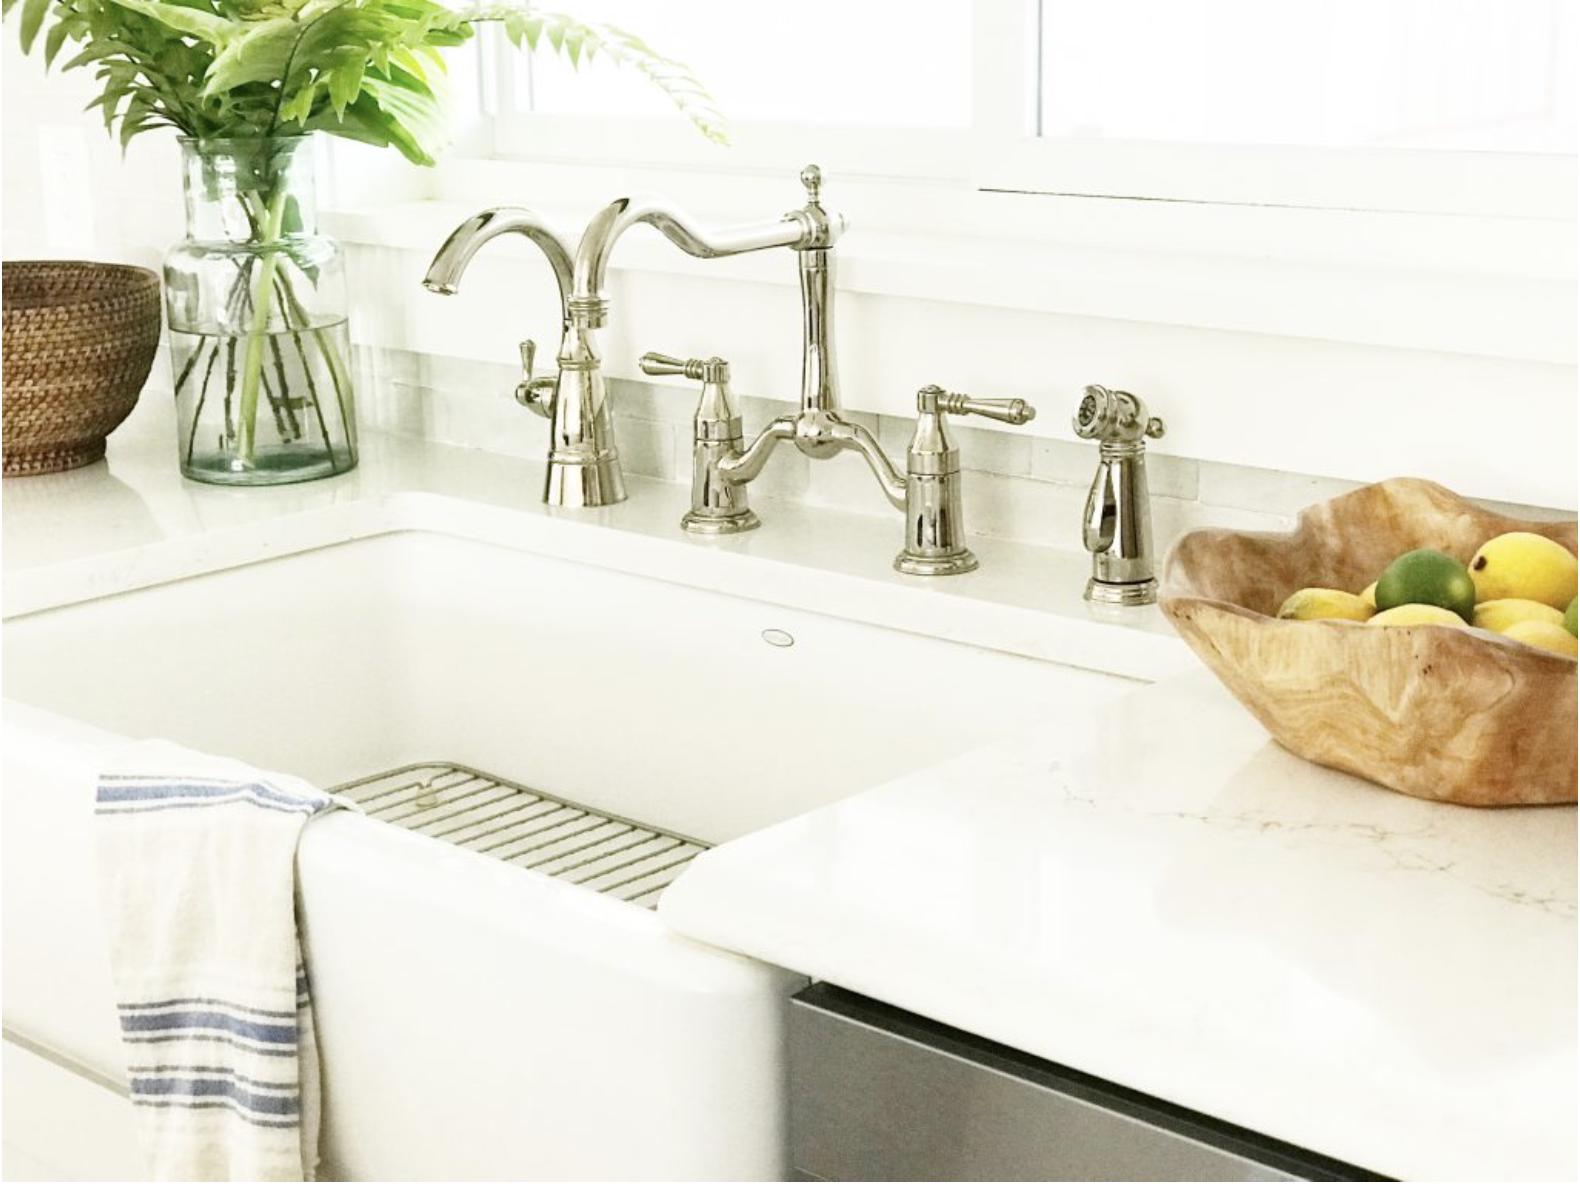 white kitchen sink.png